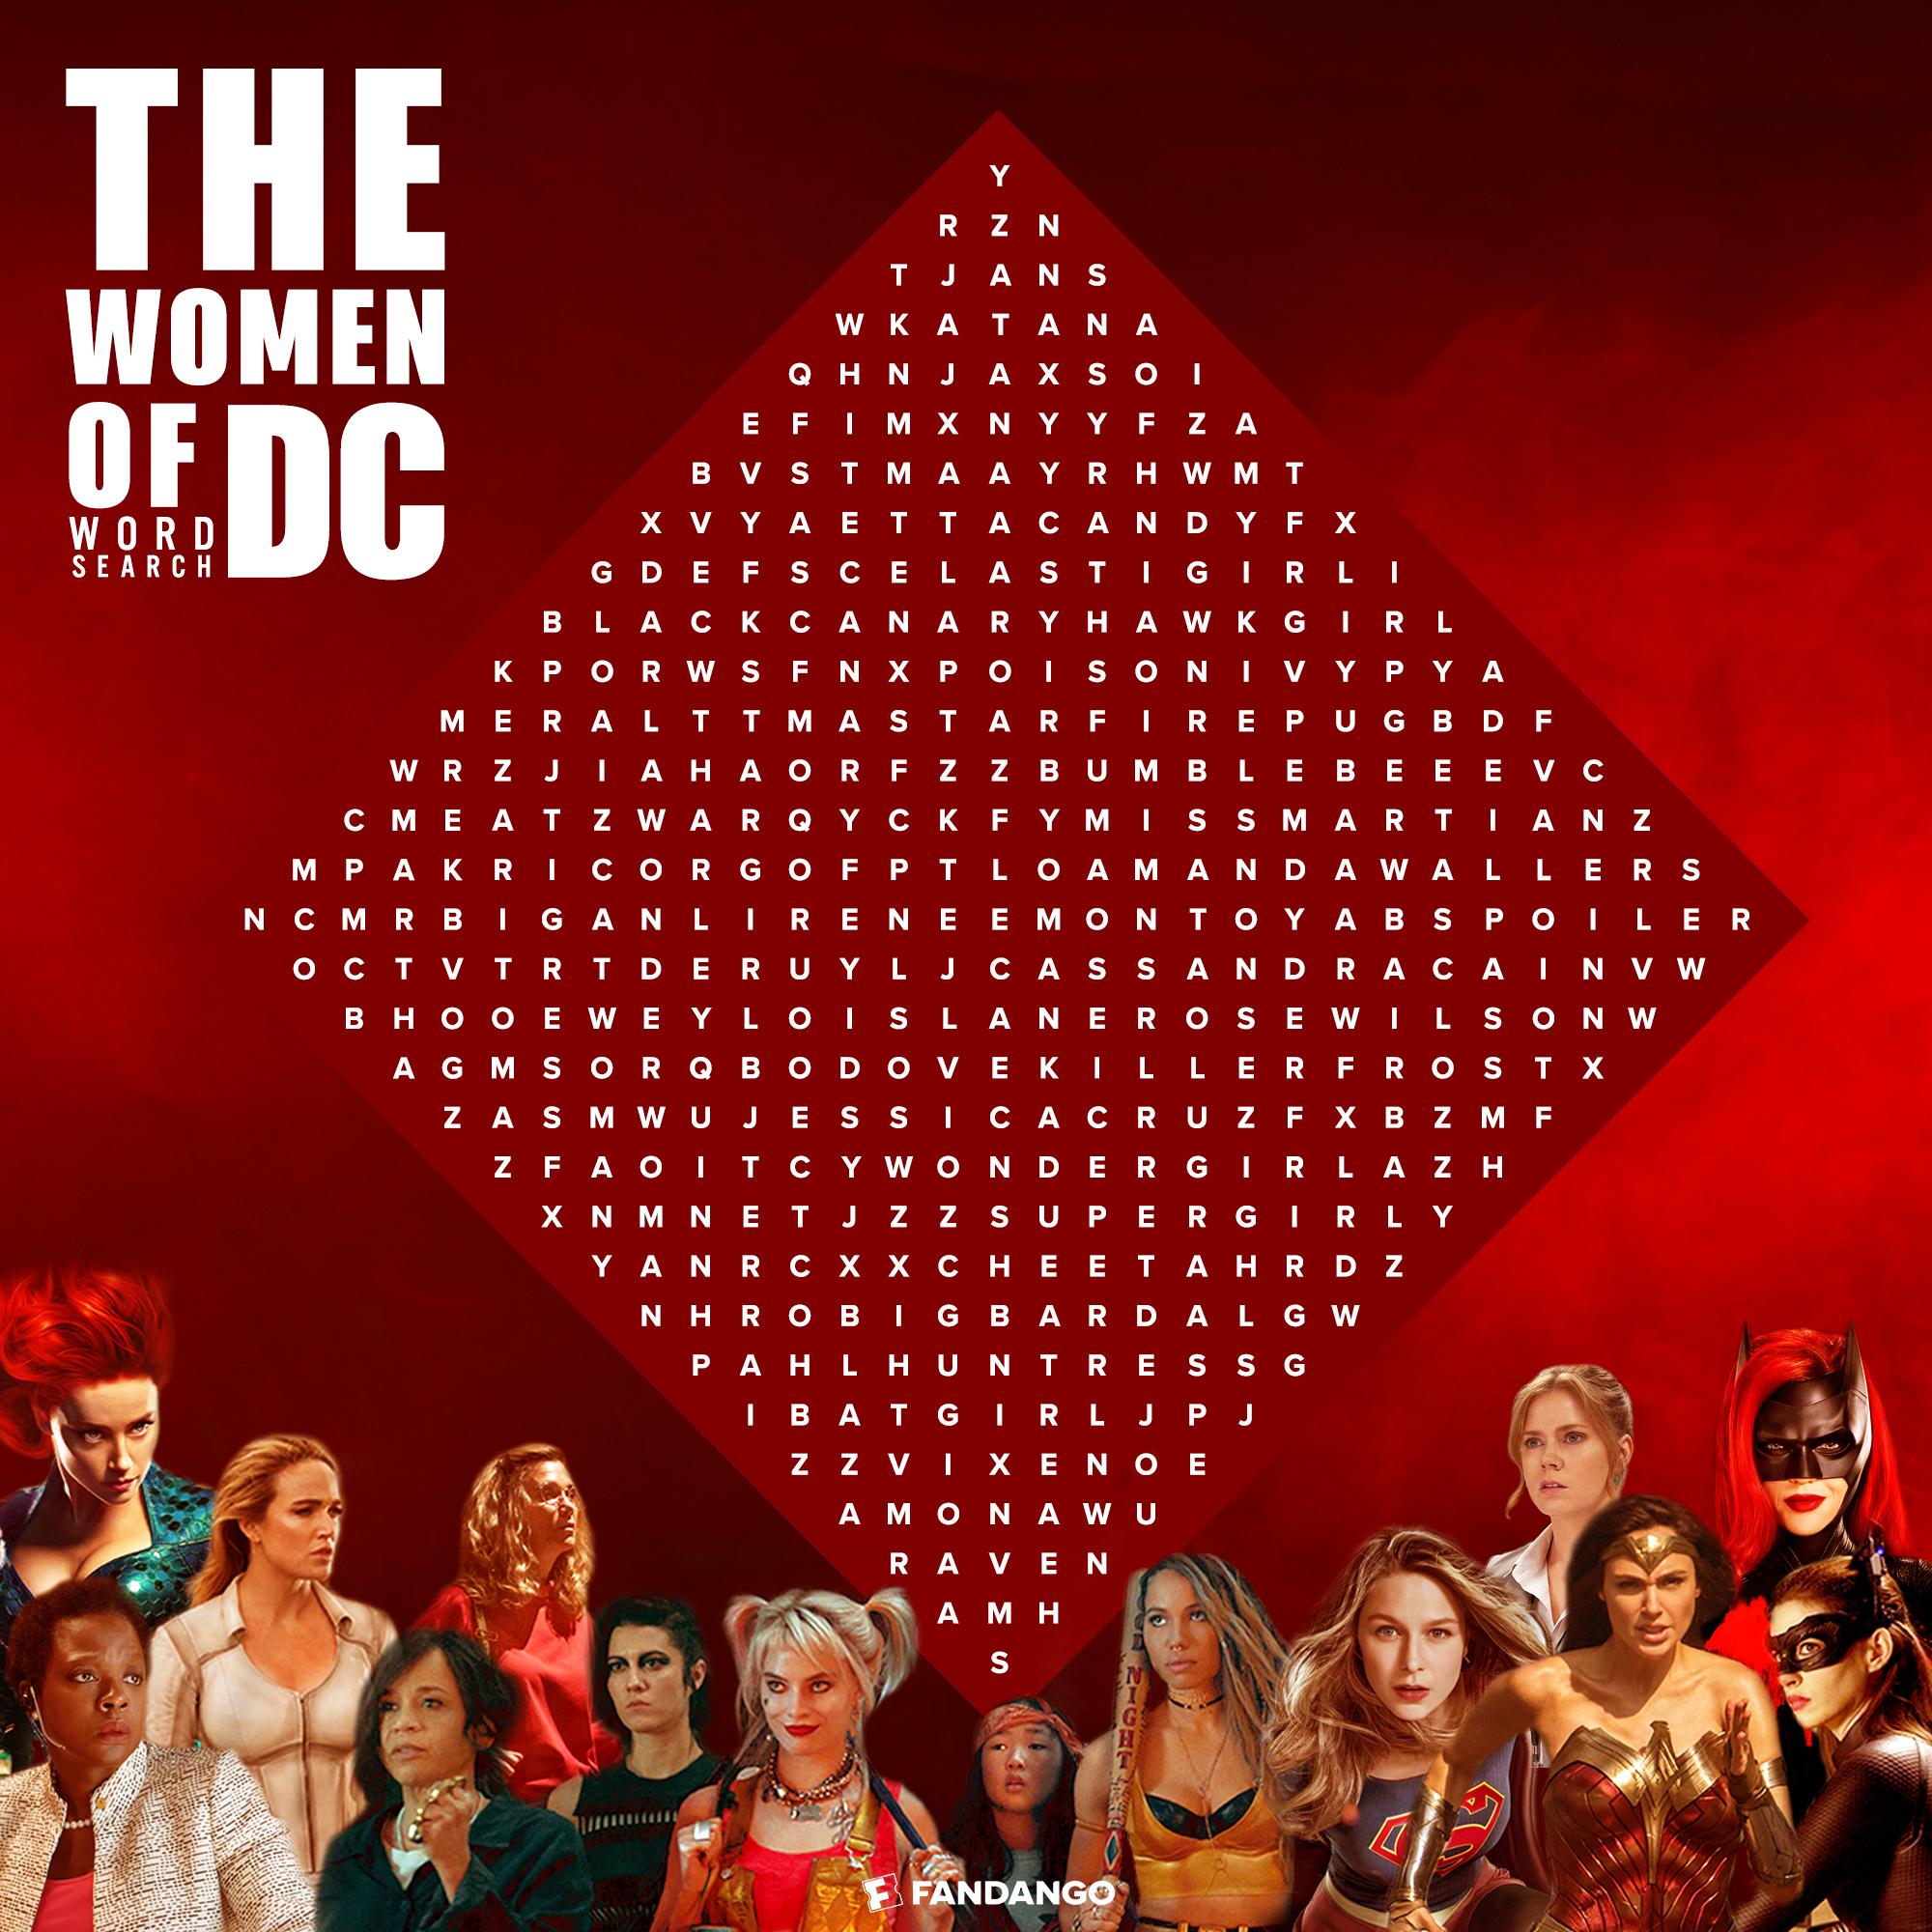 The Women of DC:  Word Search by Fandango